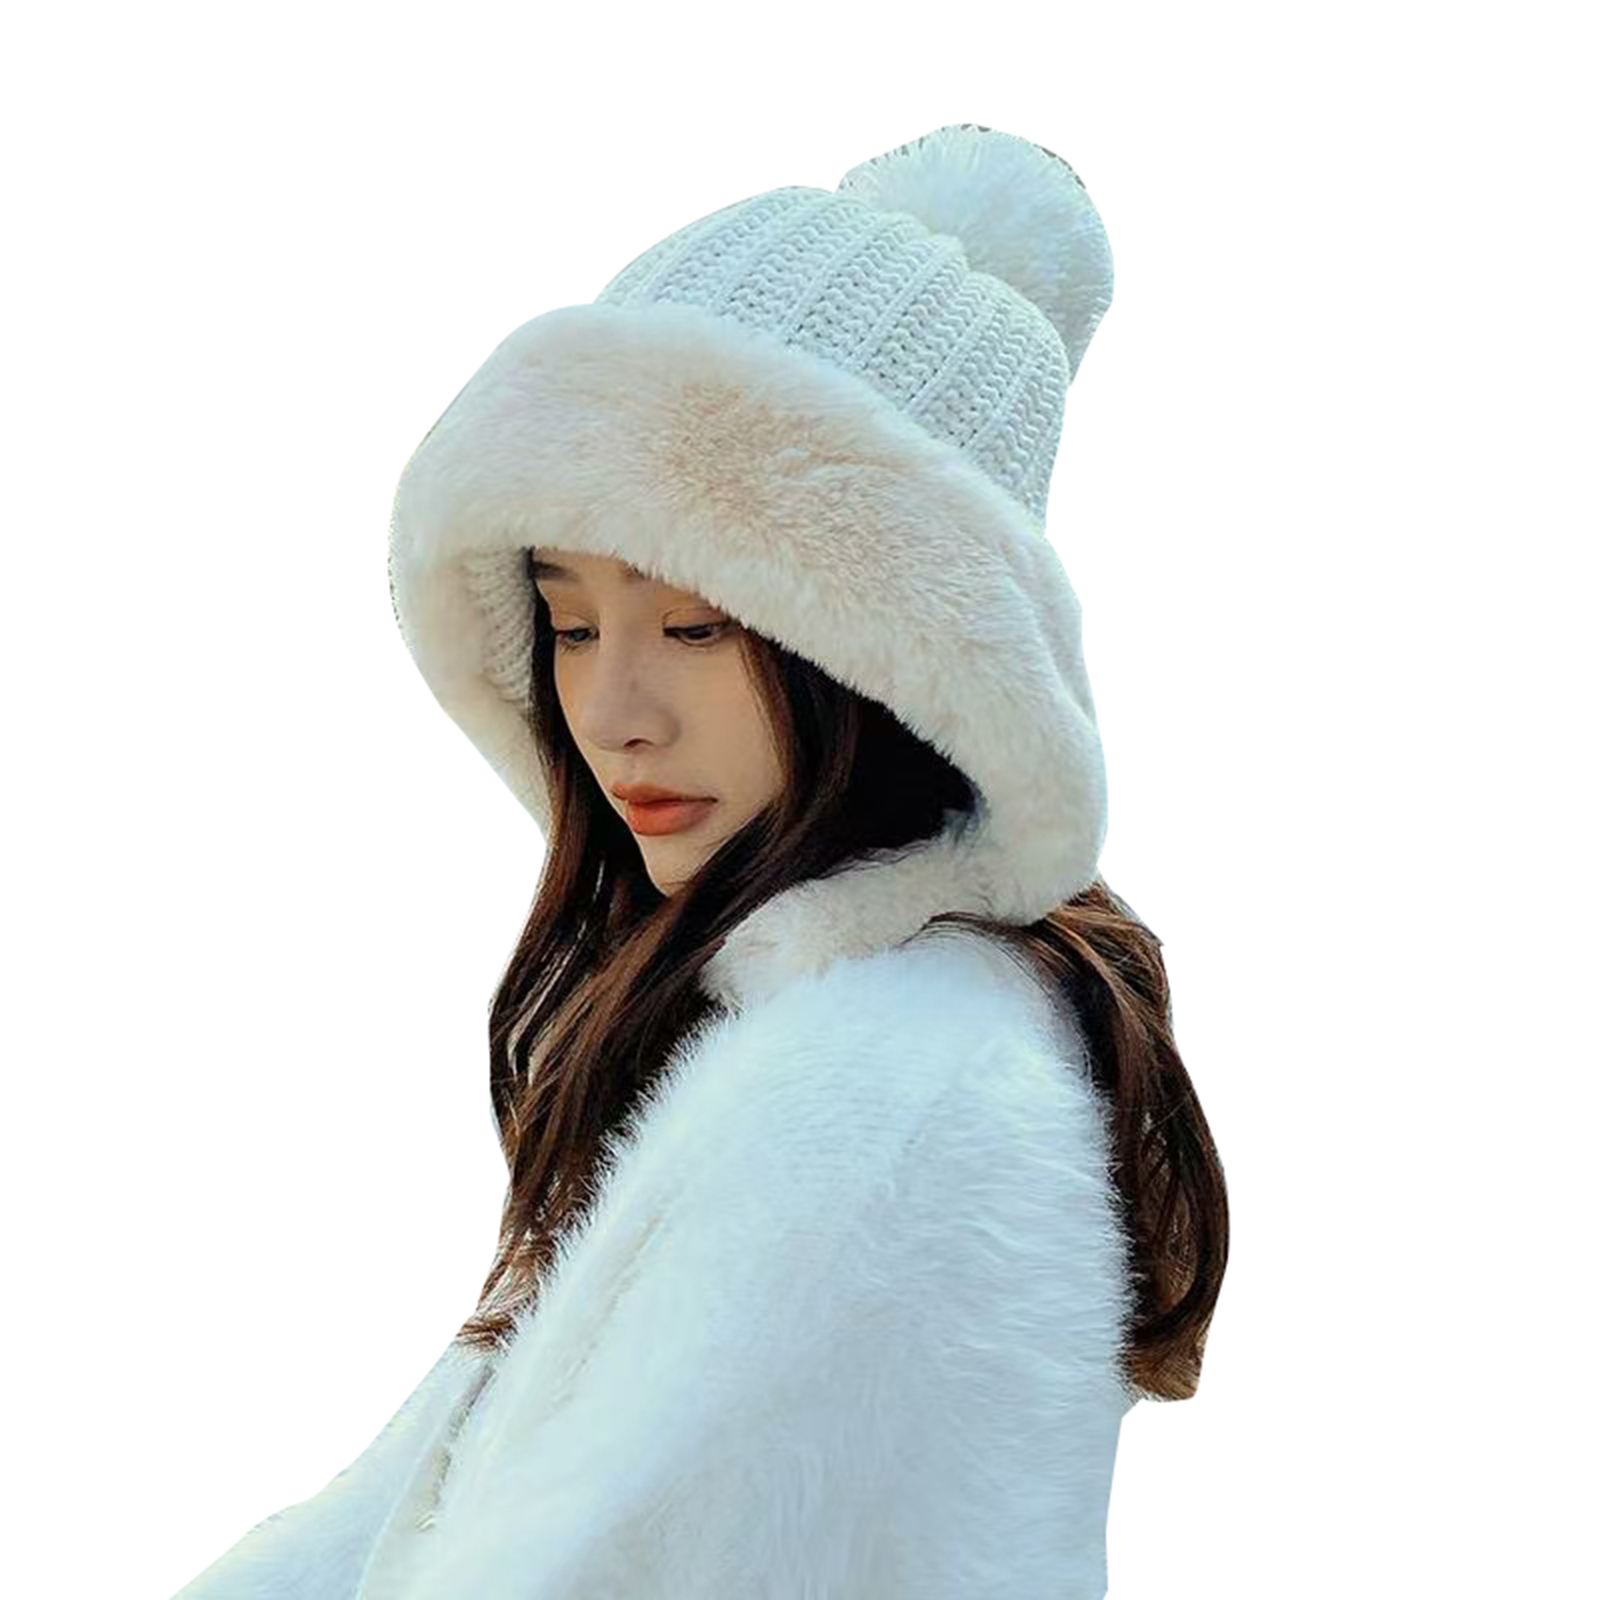 2021 Winter Warm Ear Flap Dual Layered Hats For Women Fashion Beanie Ski Hats Fleece Lined Caps For Women Men Gorras Hombre